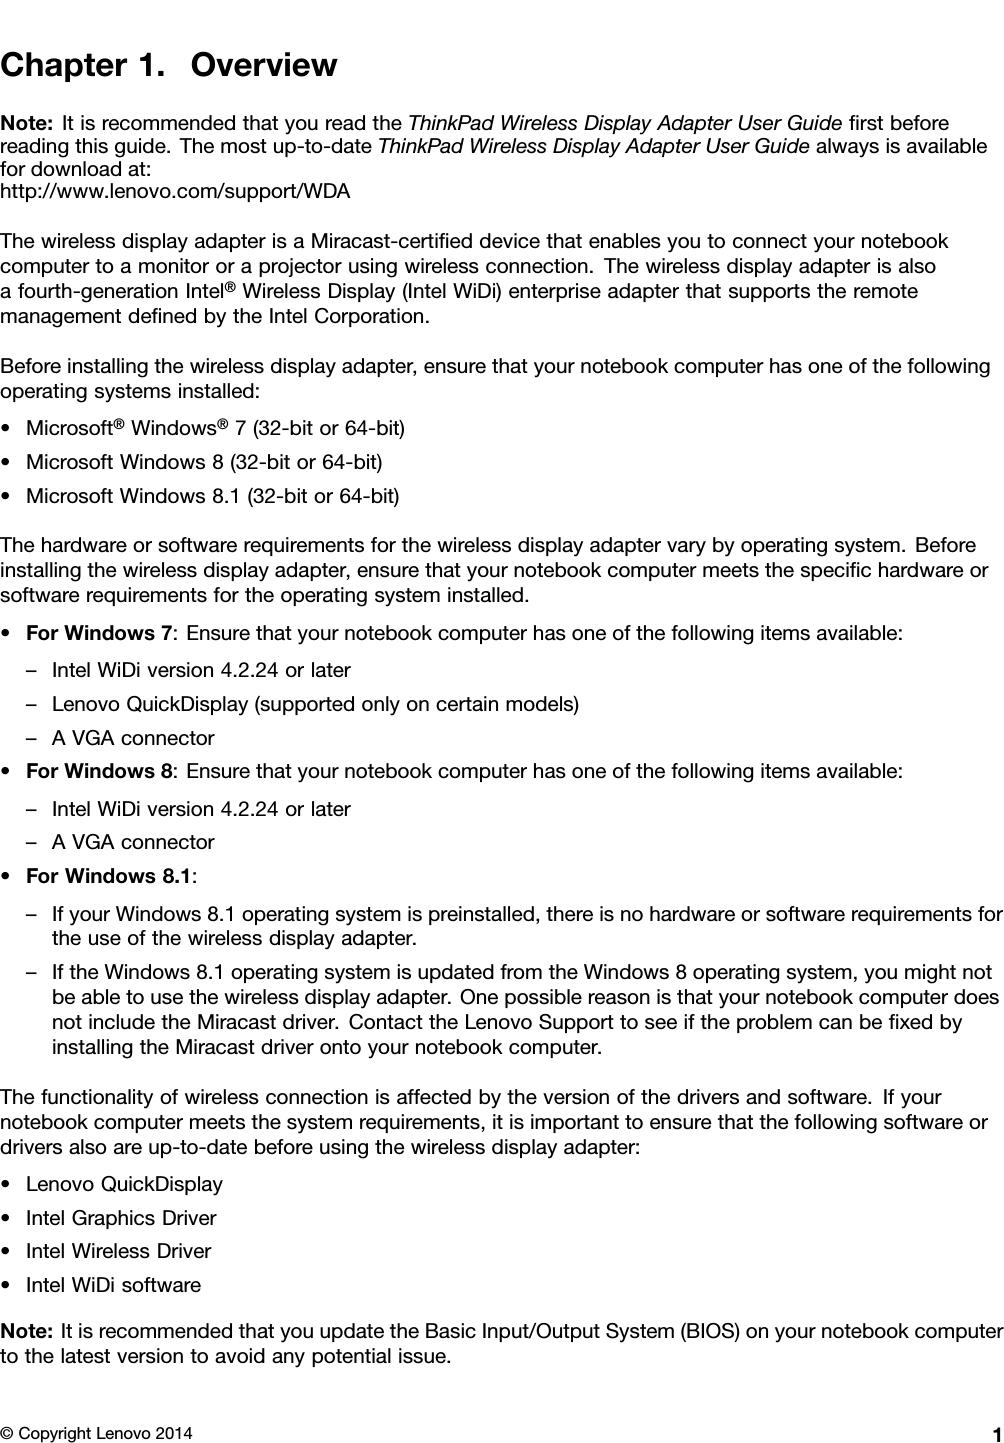 Lenovo Wda Dg En User Manual T440 Laptop (Think Pad)